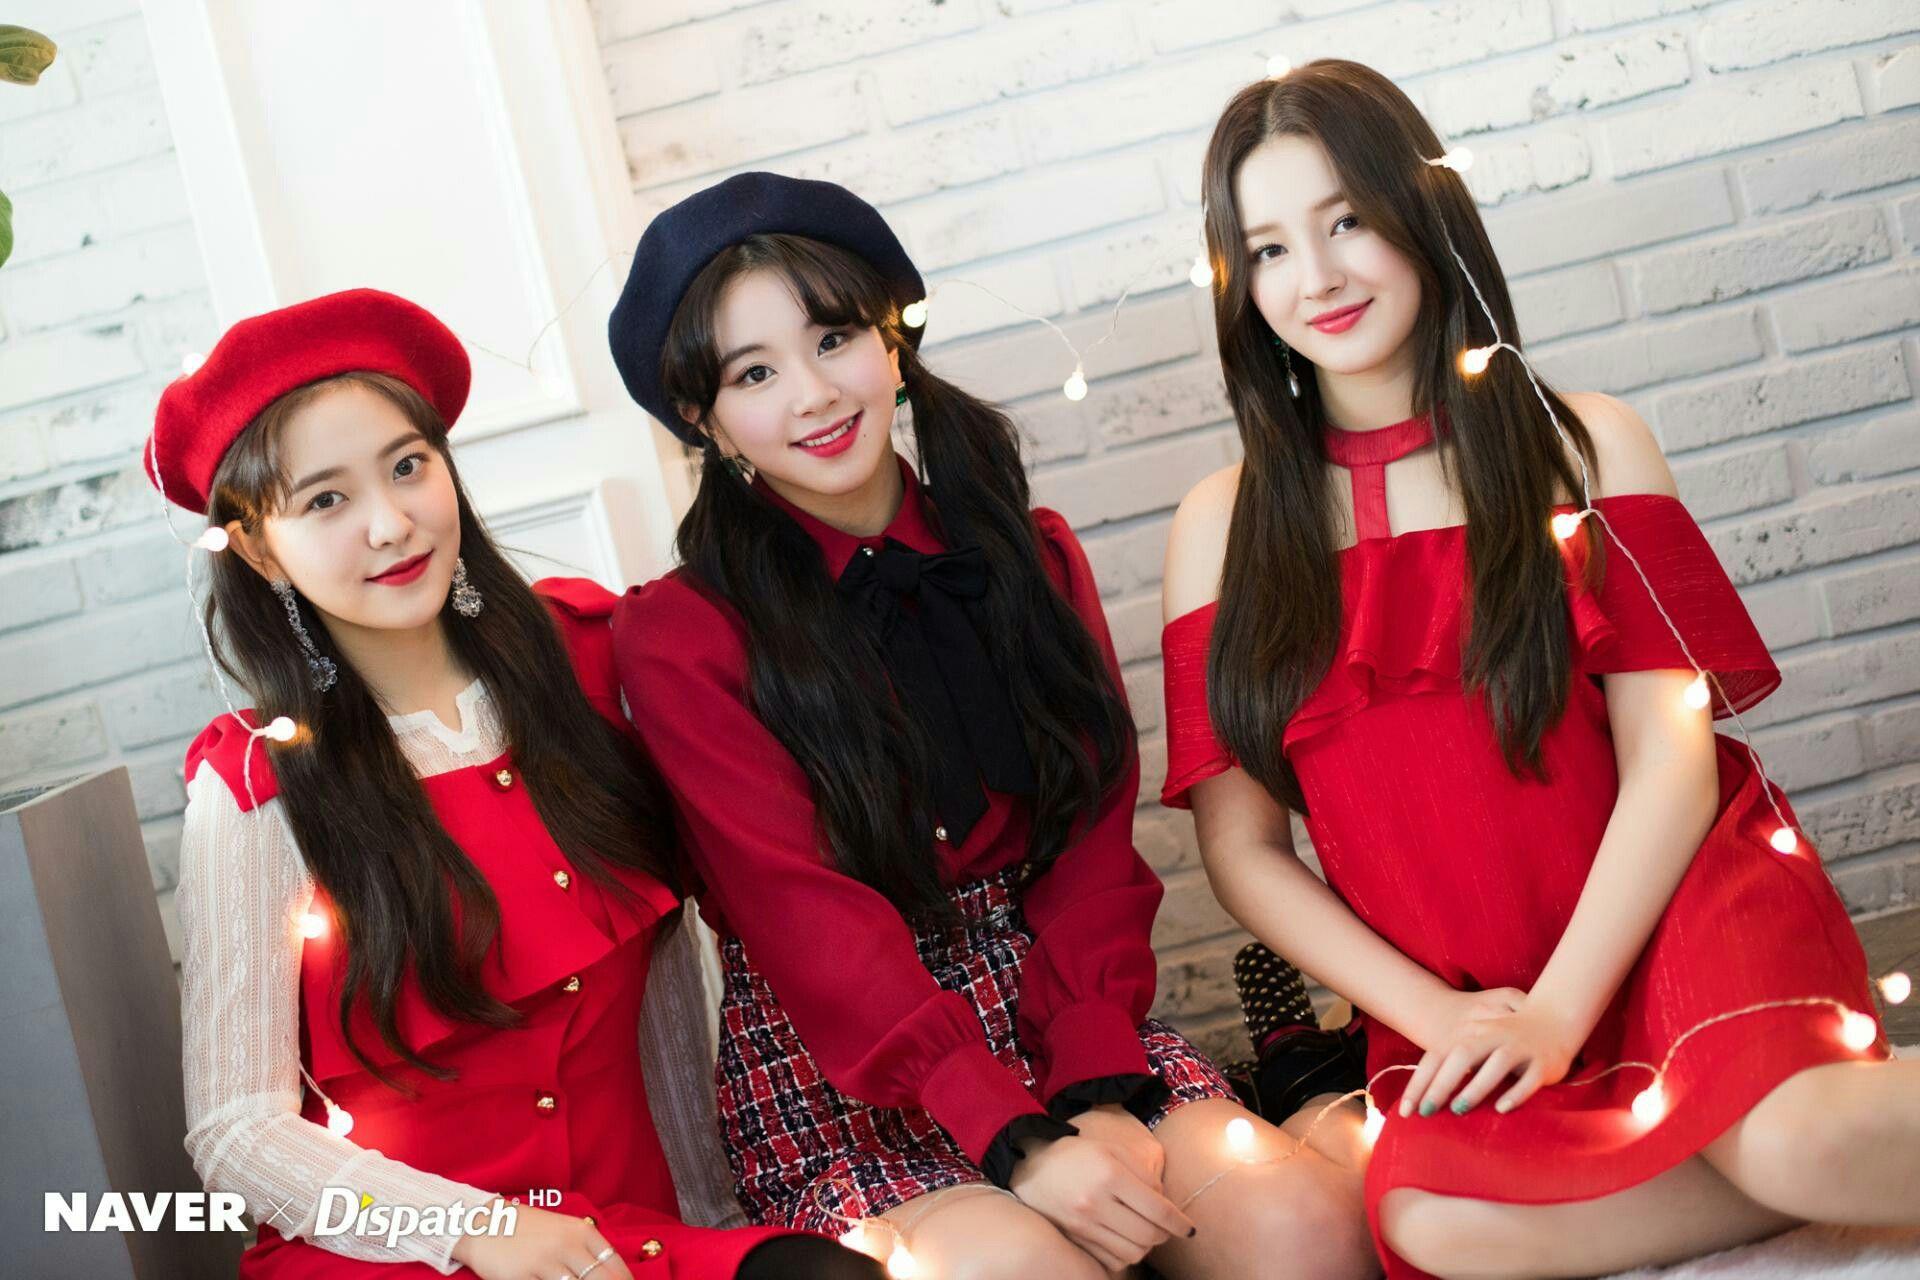 Dispatch Maknae S Christmas Party Chaeyoung Yeri Nancy Twicevelvetland Kpop Girls Lady In Red Girl